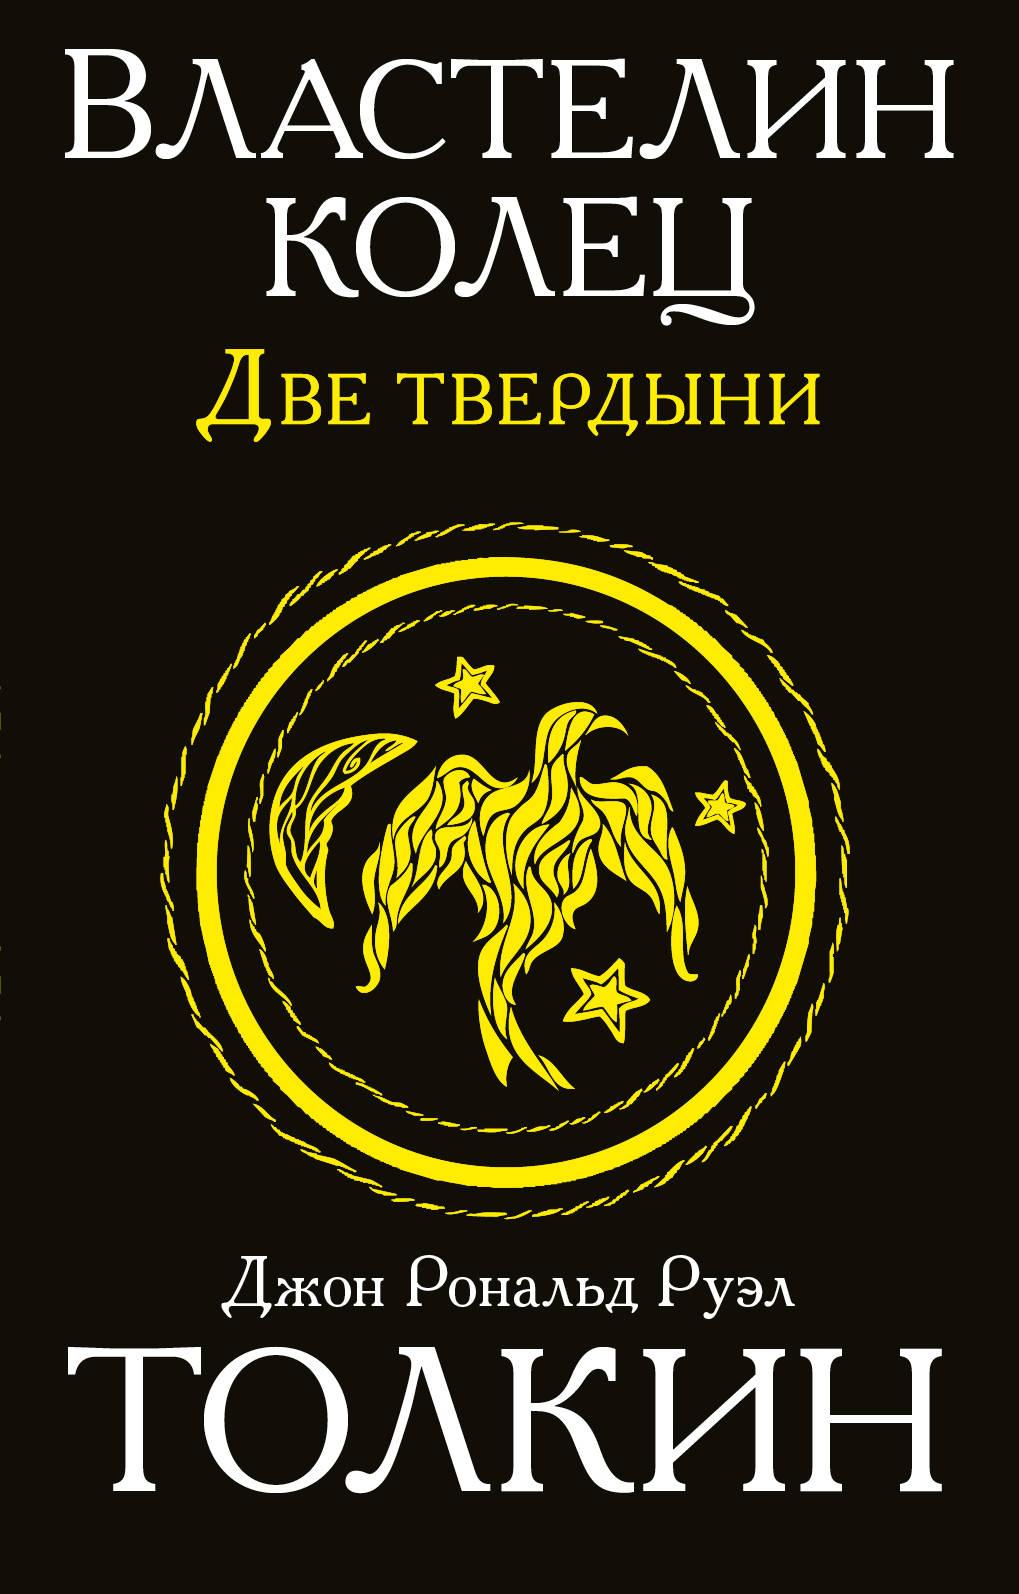 Толкин Д.Р.Р. Властелин колец. Две твердыни властелин колец трилогия 3dvd